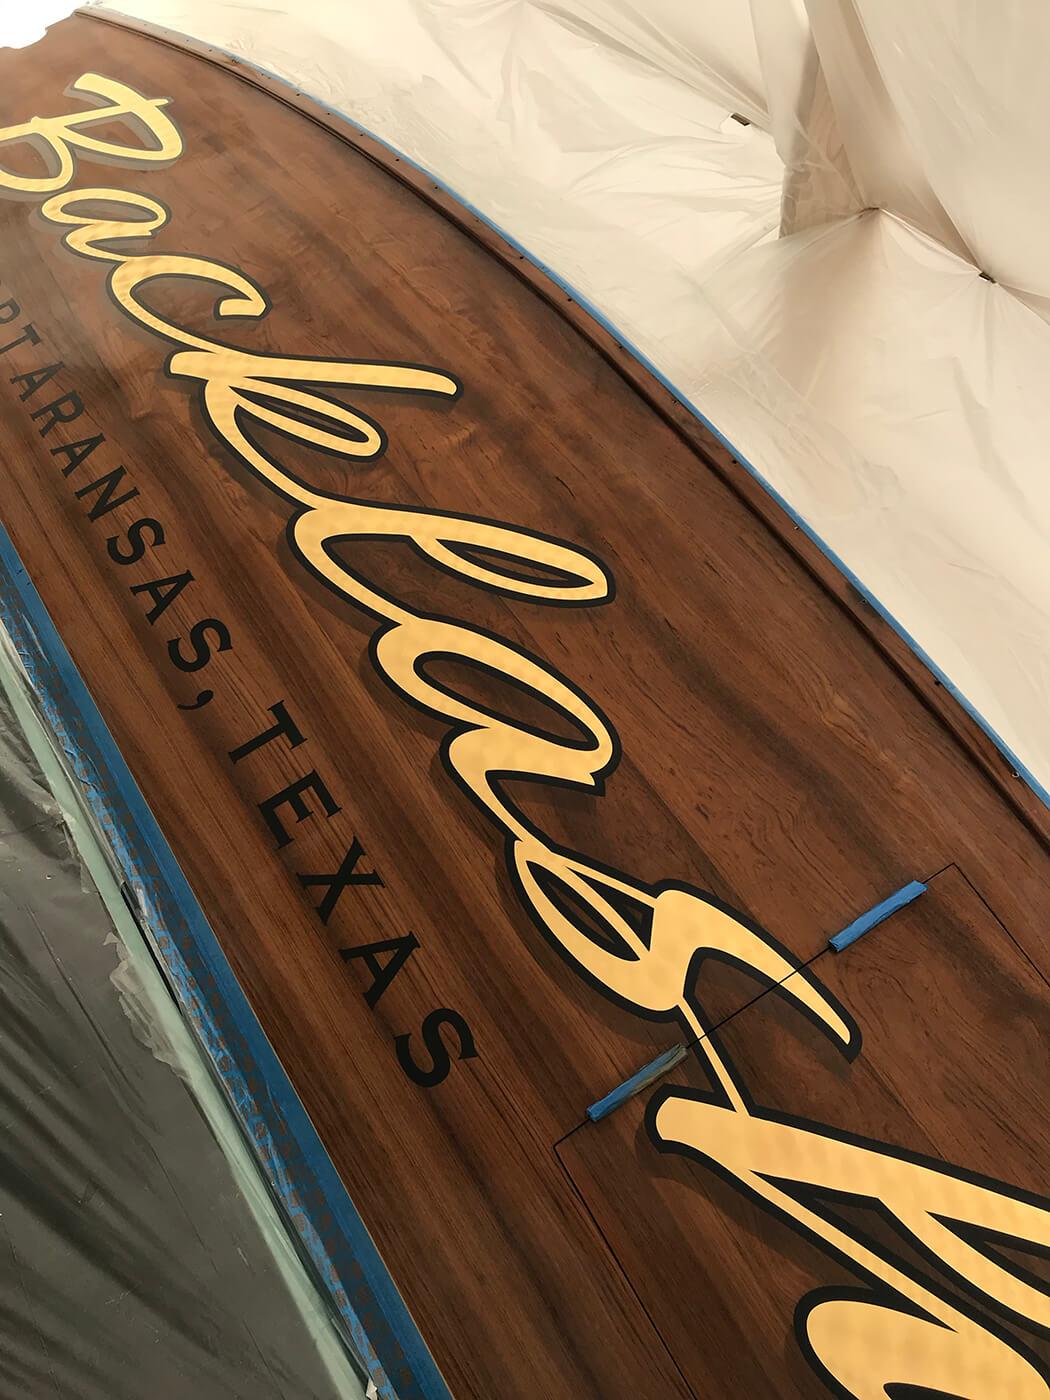 Backlash Port Aransas Texas Boat Transom engine turned yellow 24k gold leaf